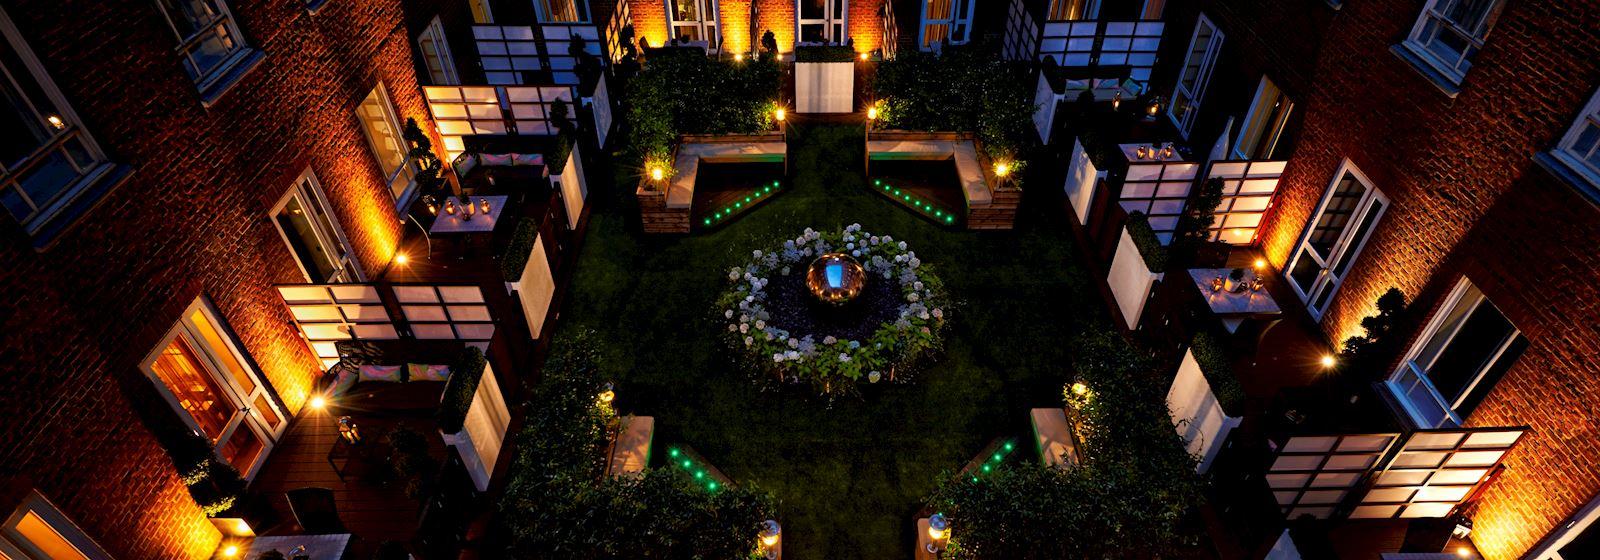 London Marriott Hotel Grosvenor Square Special Occasions